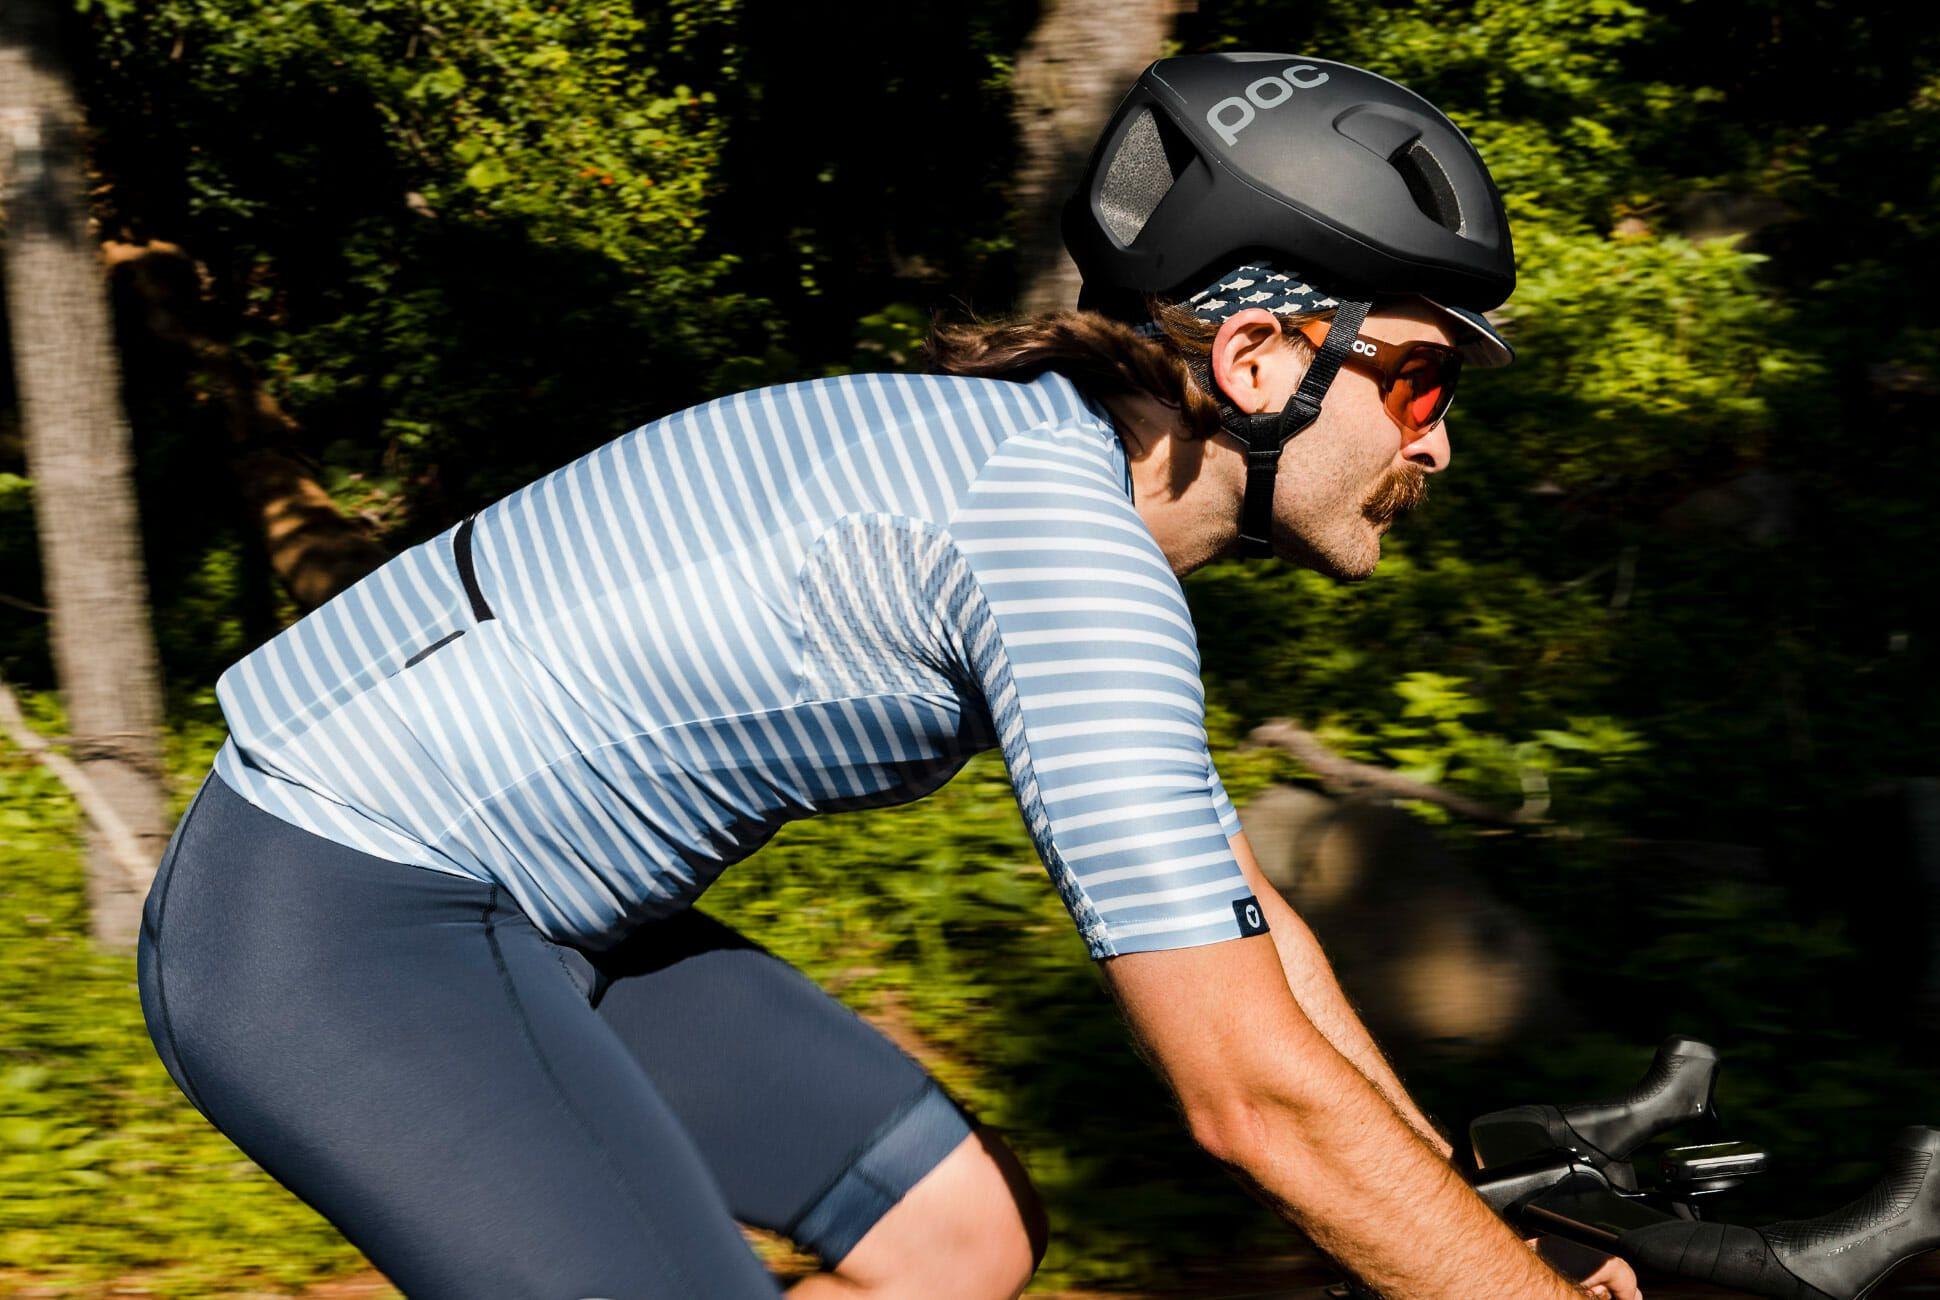 Summer-Cycling-Kits-2018-gear-patrol-ctb-slide-2